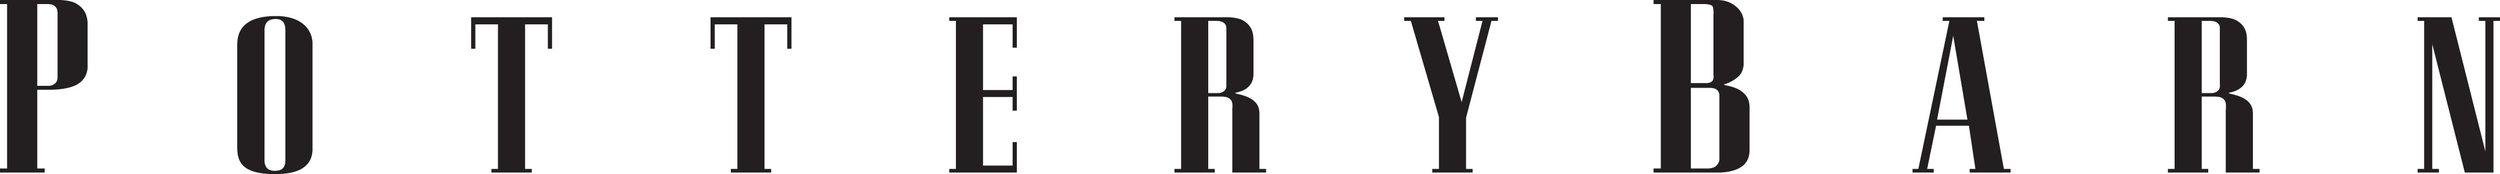 PB_Logo.jpg